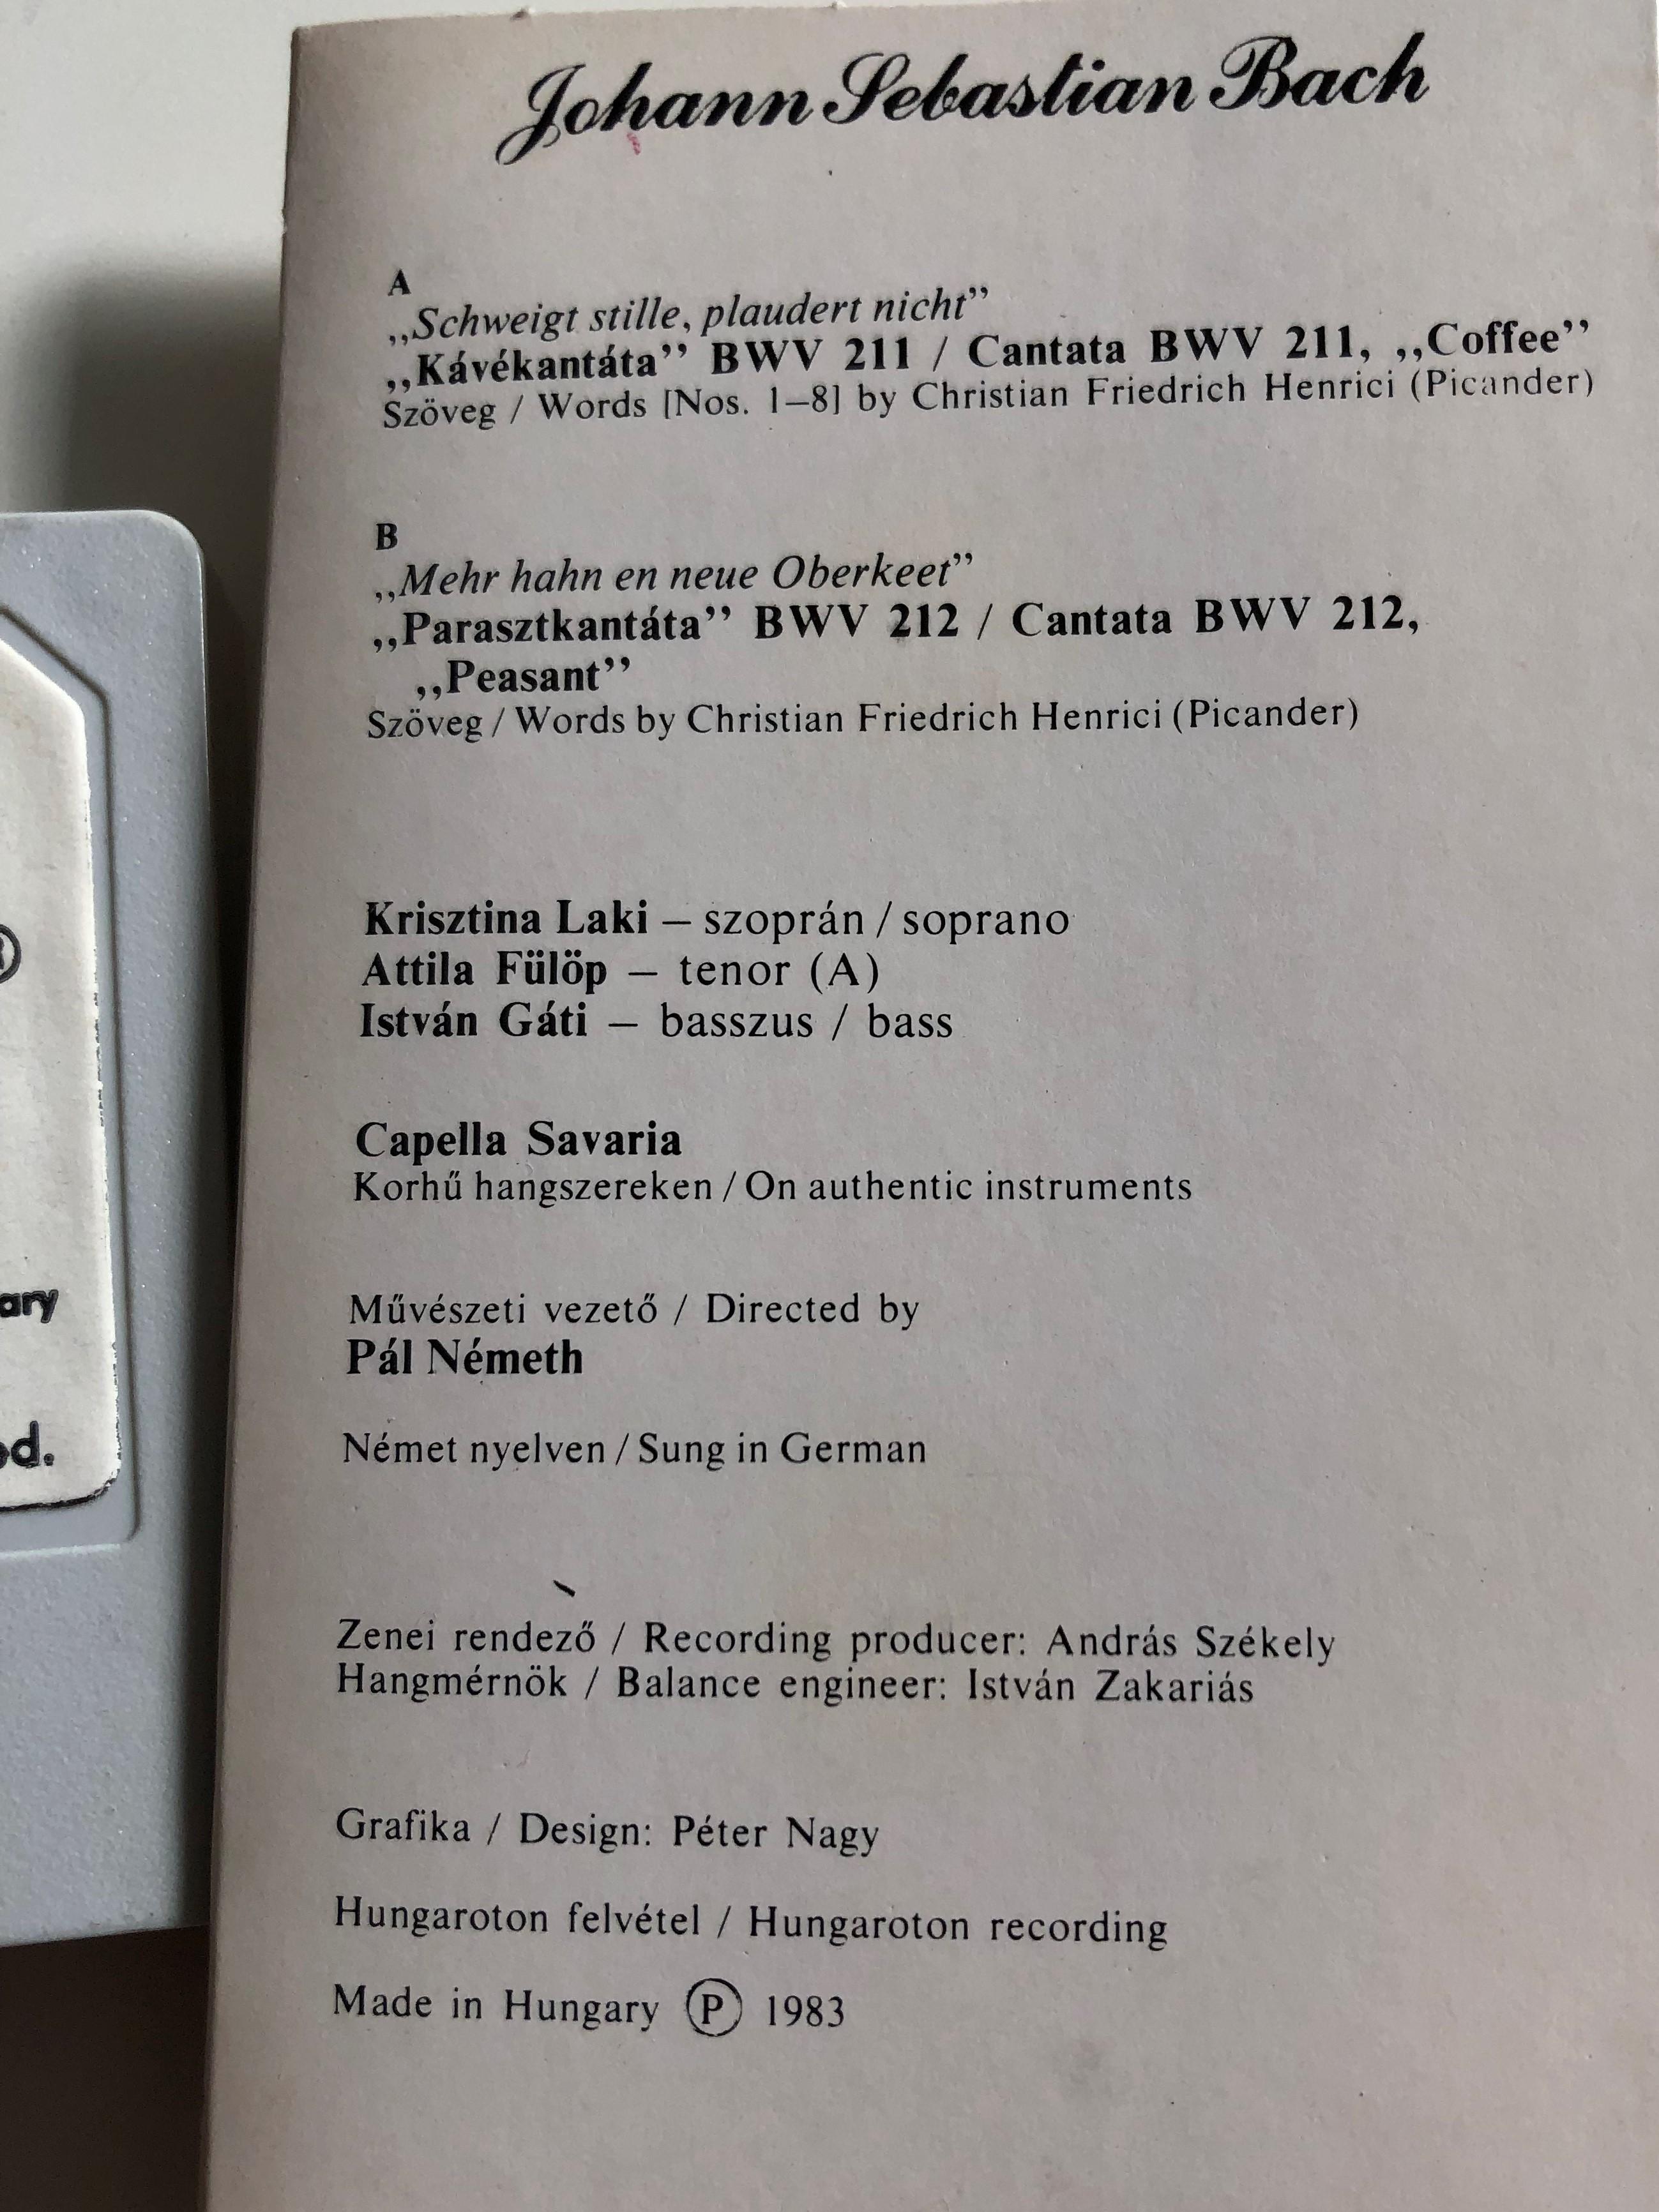 johann-sebastian-bach-cantatas-coffe-peasant-krisztina-laki-istv-n-g-ti-attila-f-l-p-directed-p-l-n-meth-capella-savaria-hungaroton-cassette-stereo-mk-12462-3-.jpg